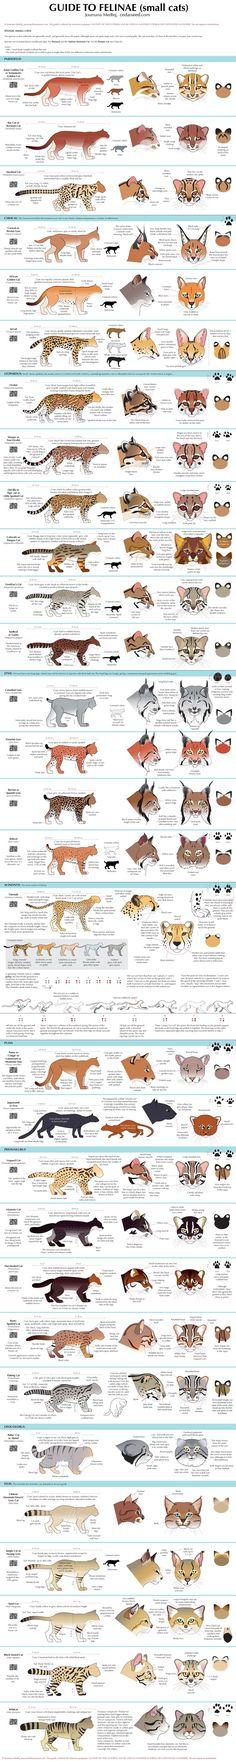 Guide to Little Cats - by Majnouna, via deviantART   ...Small BIG Cats...